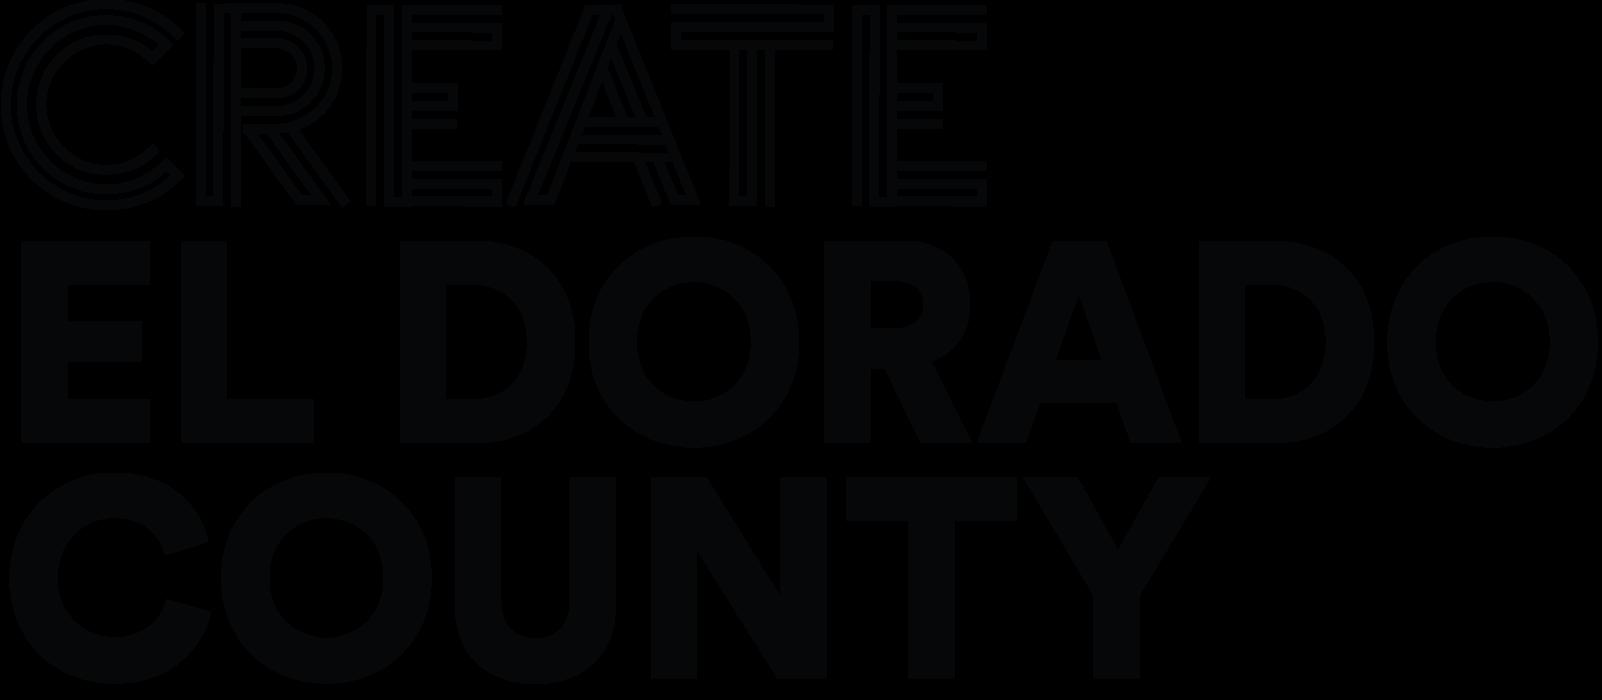 https://secureservercdn.net/198.71.233.51/mgq.552.myftpupload.com/wp-content/uploads/2020/01/Create-Ca-County-Logos-08-e1580493351662.png?time=1586334232